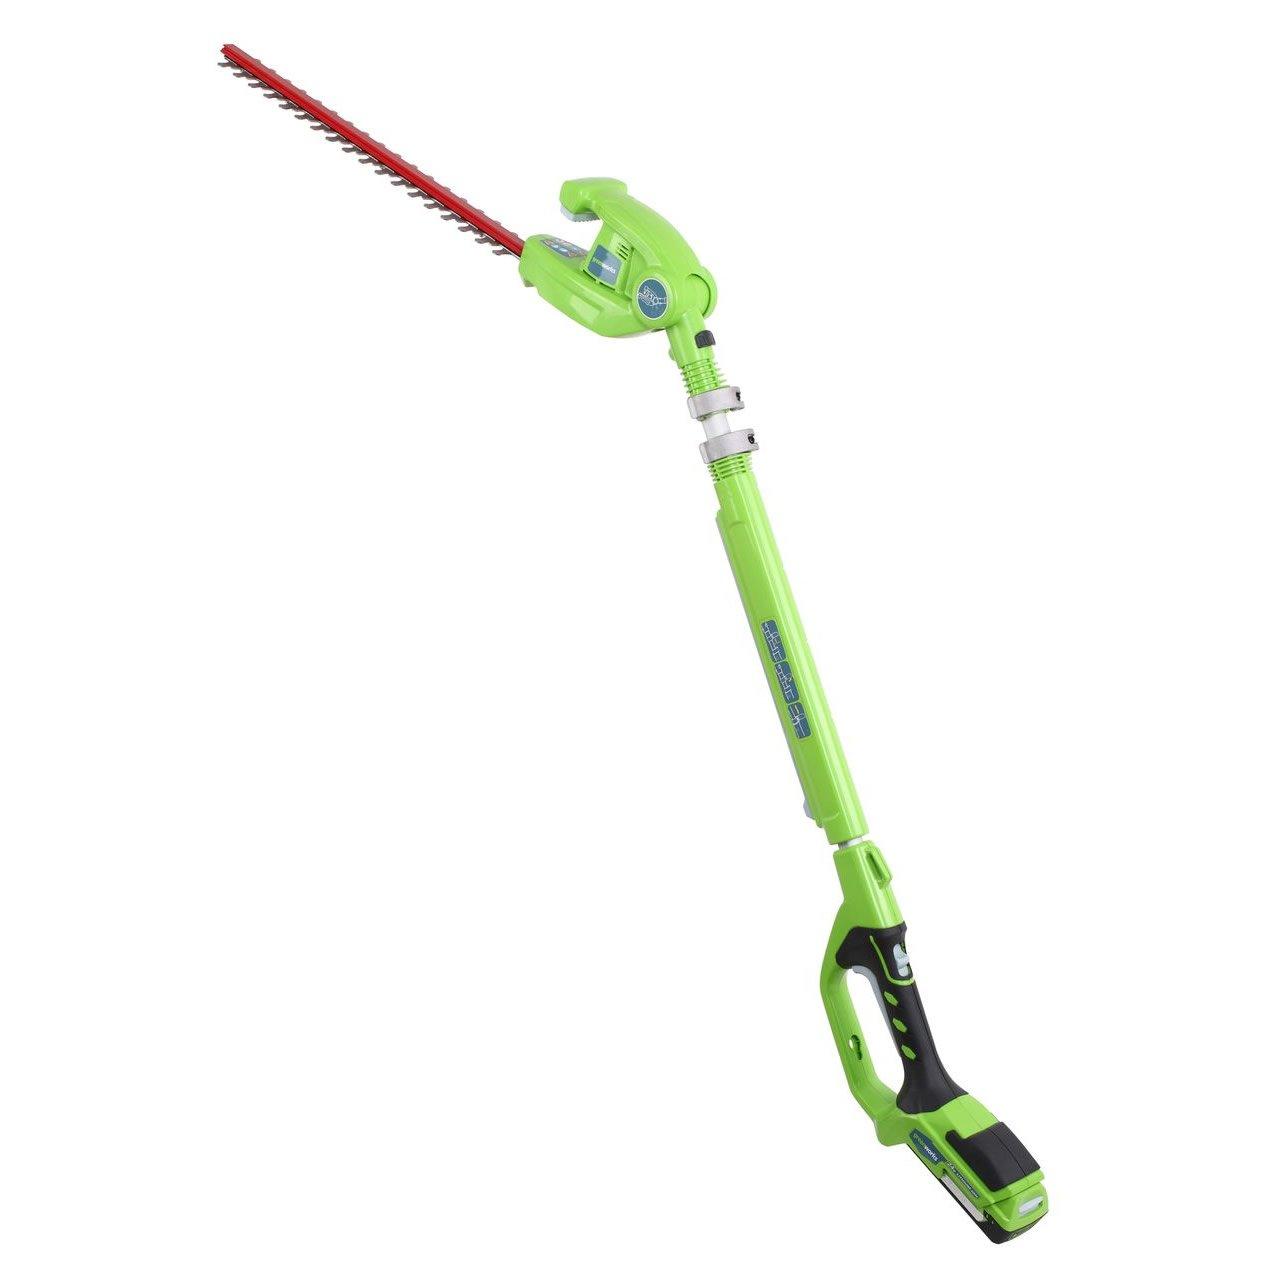 Greenworks 24v Long Reach Cordless Hedge Trimmer (2200207-A)